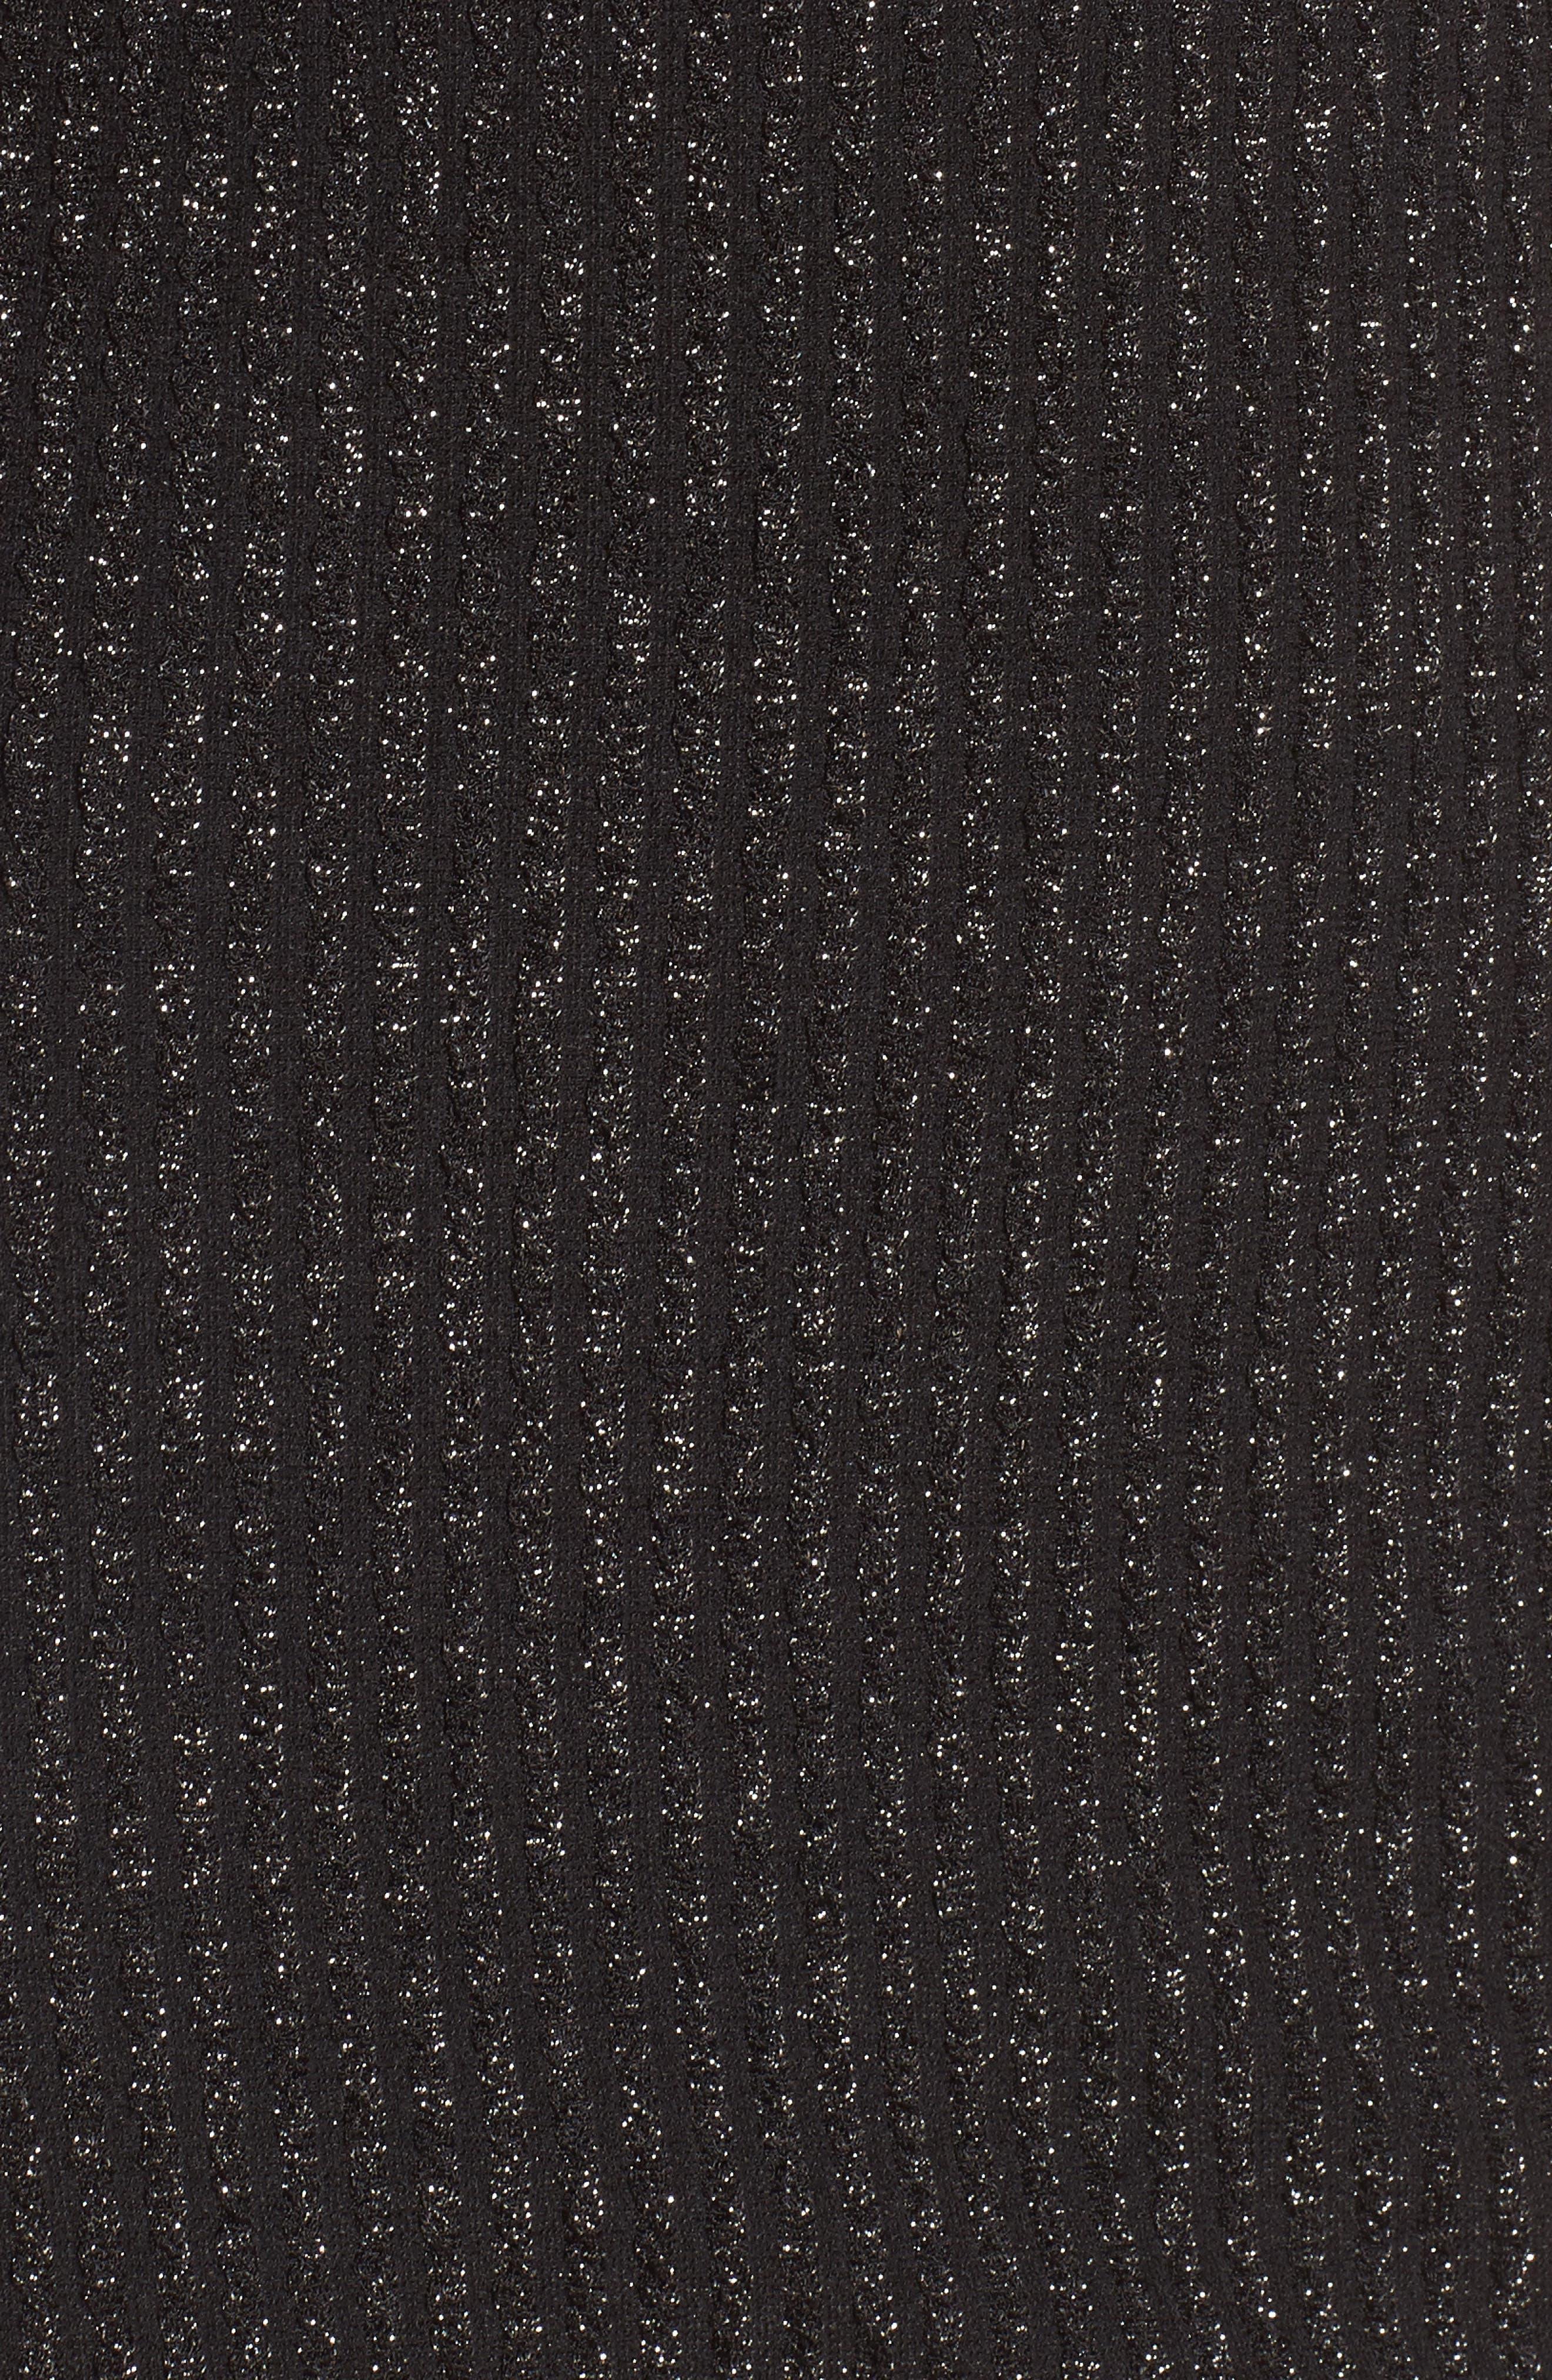 Cami Minidress,                             Alternate thumbnail 5, color,                             005